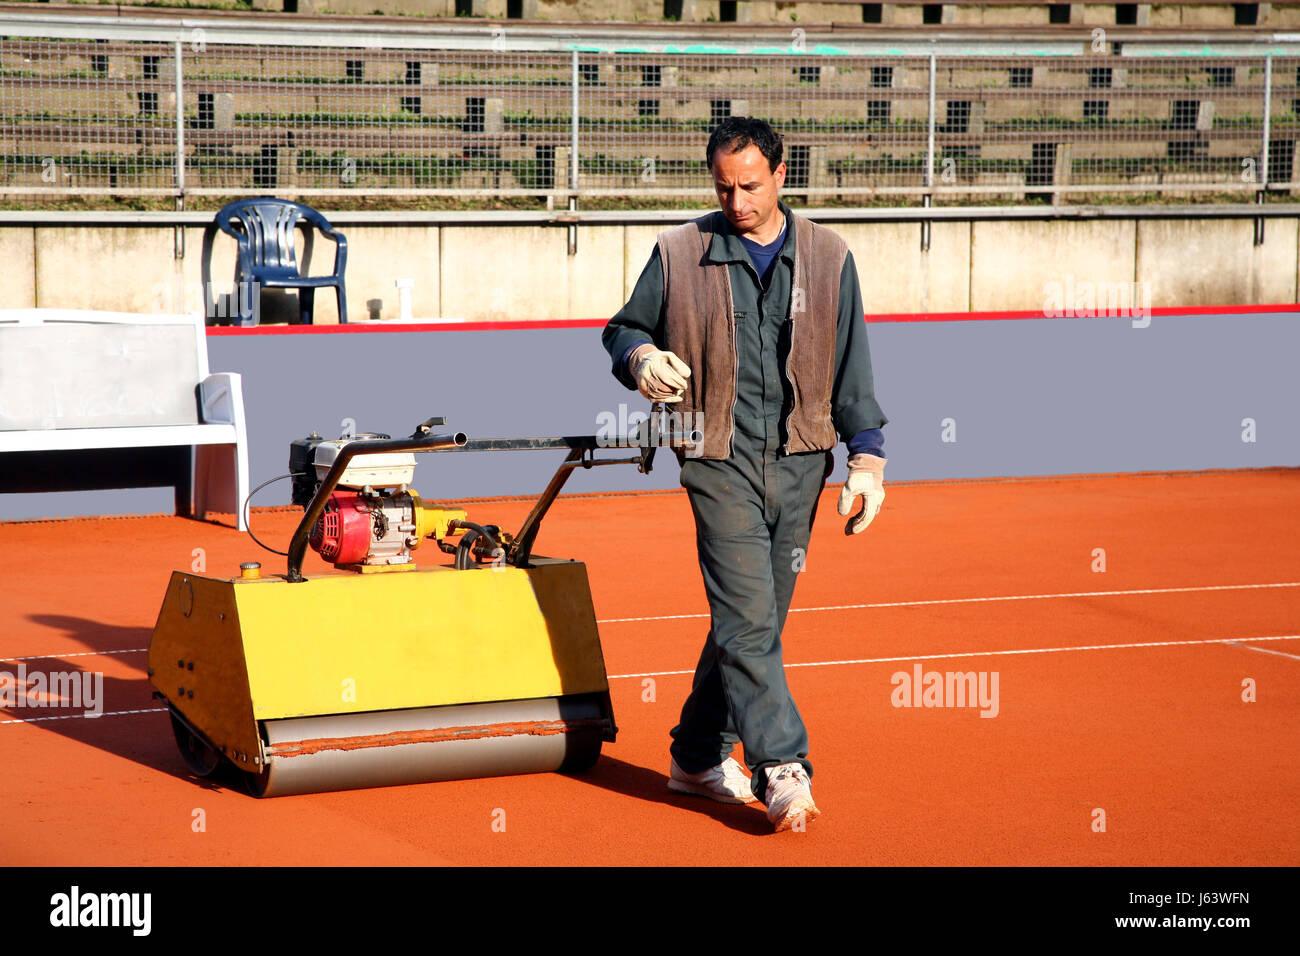 Roll Roller Tennis Court Work Job Labor Workers Laborer Worker Stock